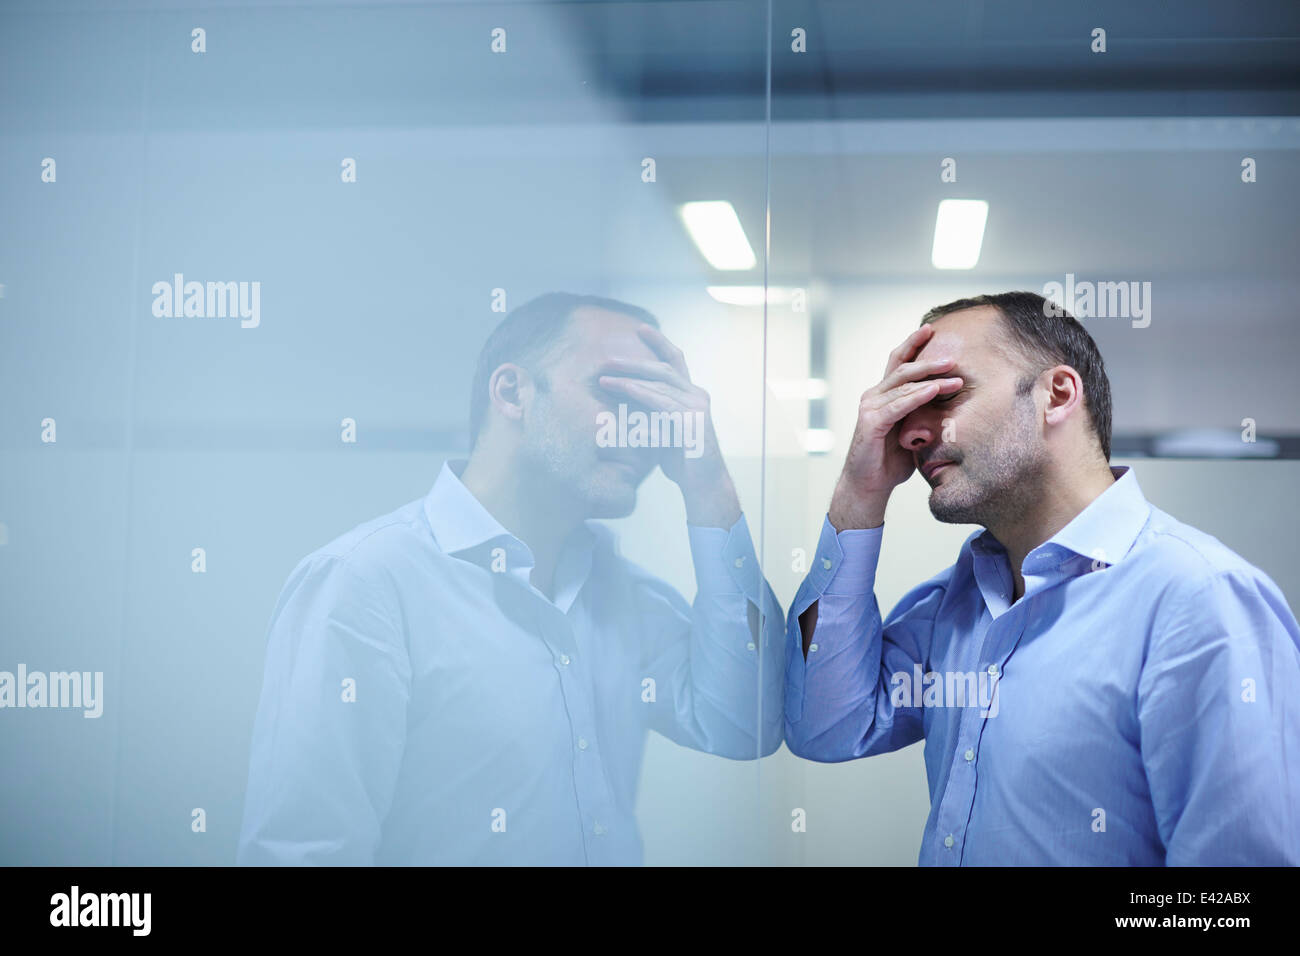 Man in despair facing reflective wall - Stock Image